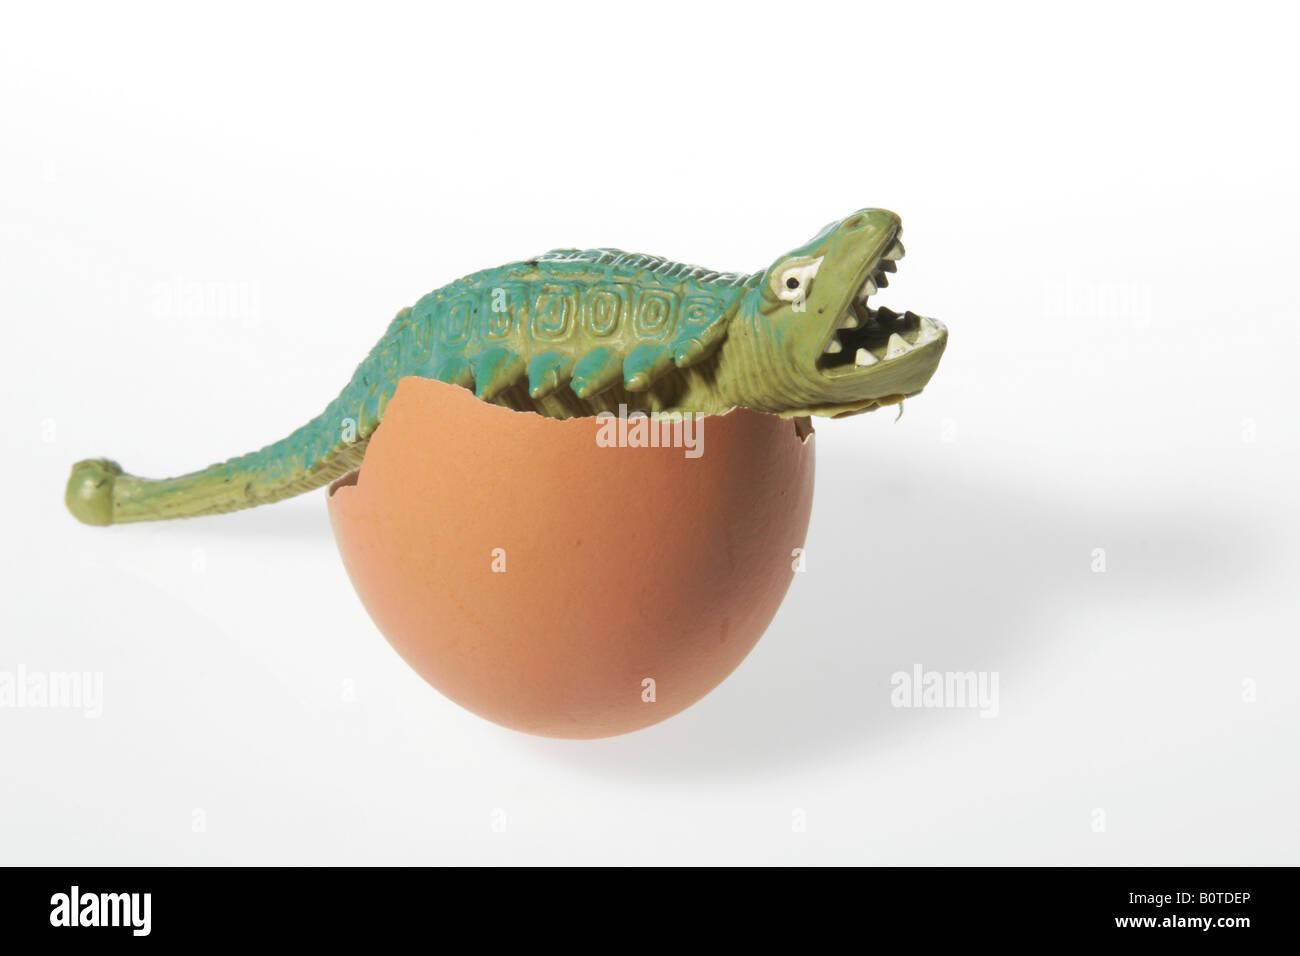 dinosaur hatchling - Stock Image